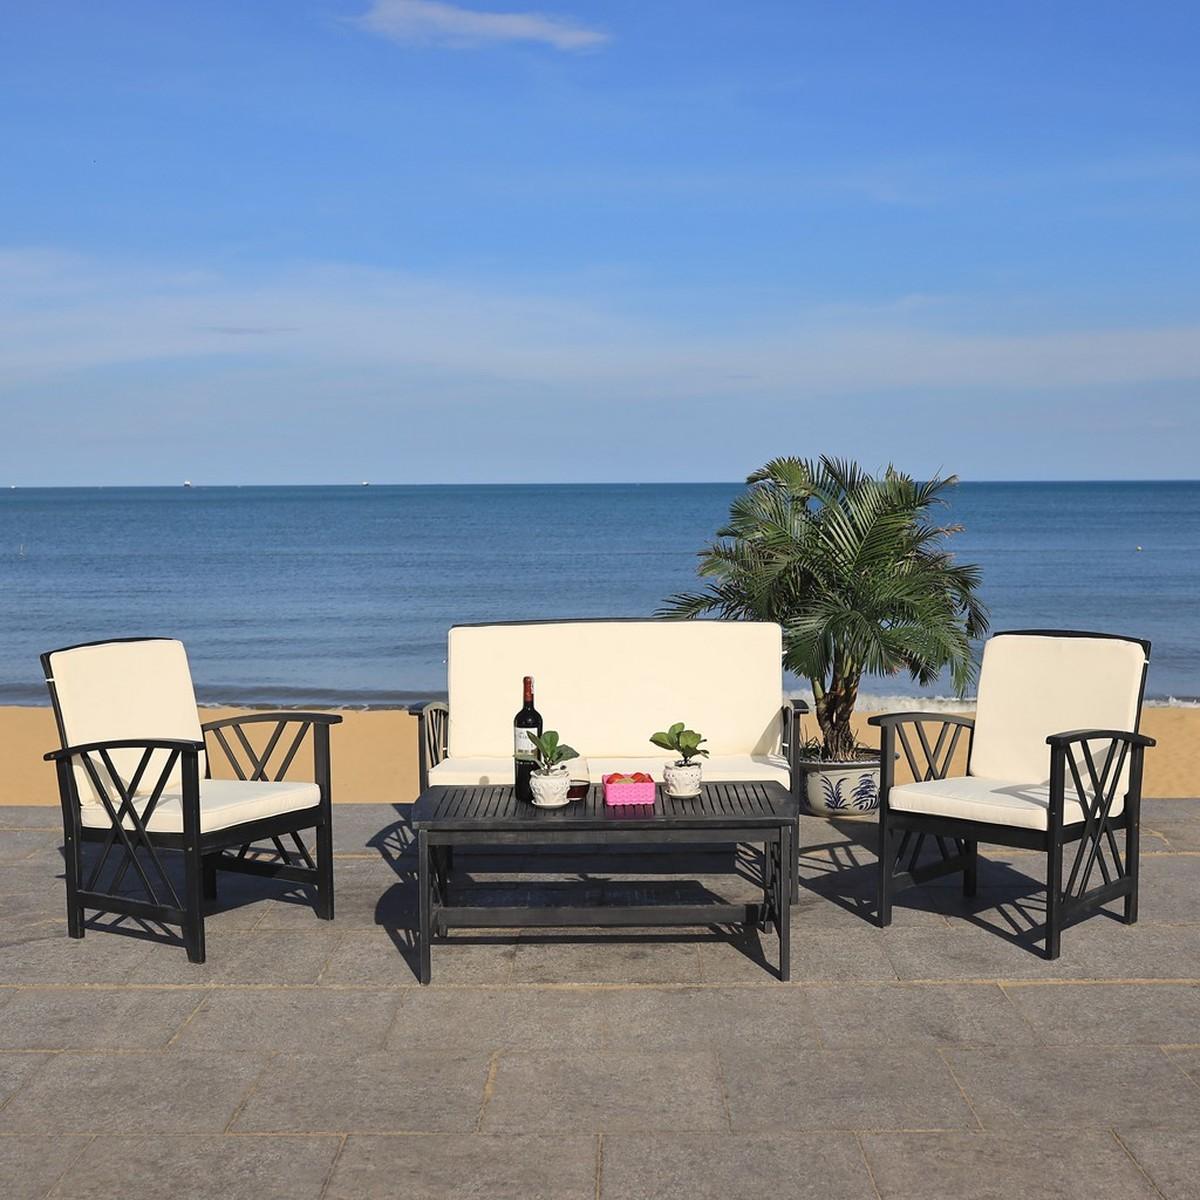 PAT7008E Patio Sets - 4 Piece - Furniture by Safavieh on Safavieh Outdoor Living Fontana id=24100